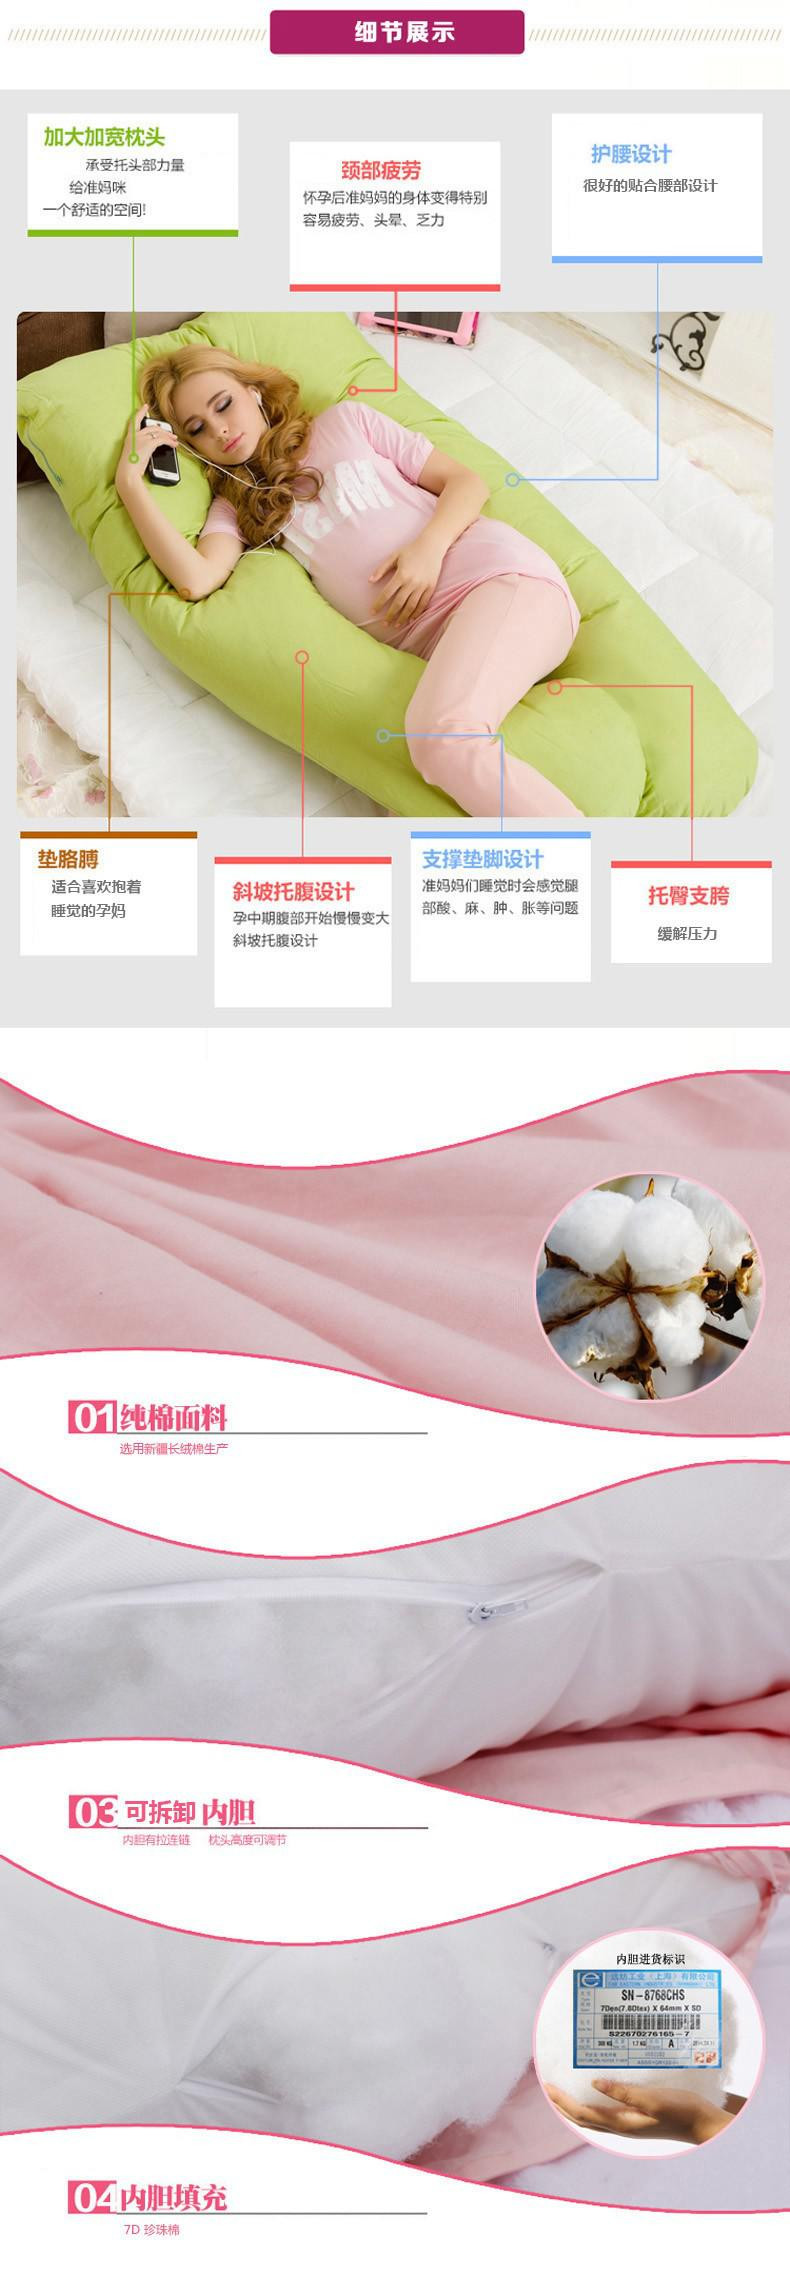 HTB1lHtZOpXXXXXQapXXq6xXFXXXp - Pregnancy Comfortable U Type Body Pillow For Side Sleep Position